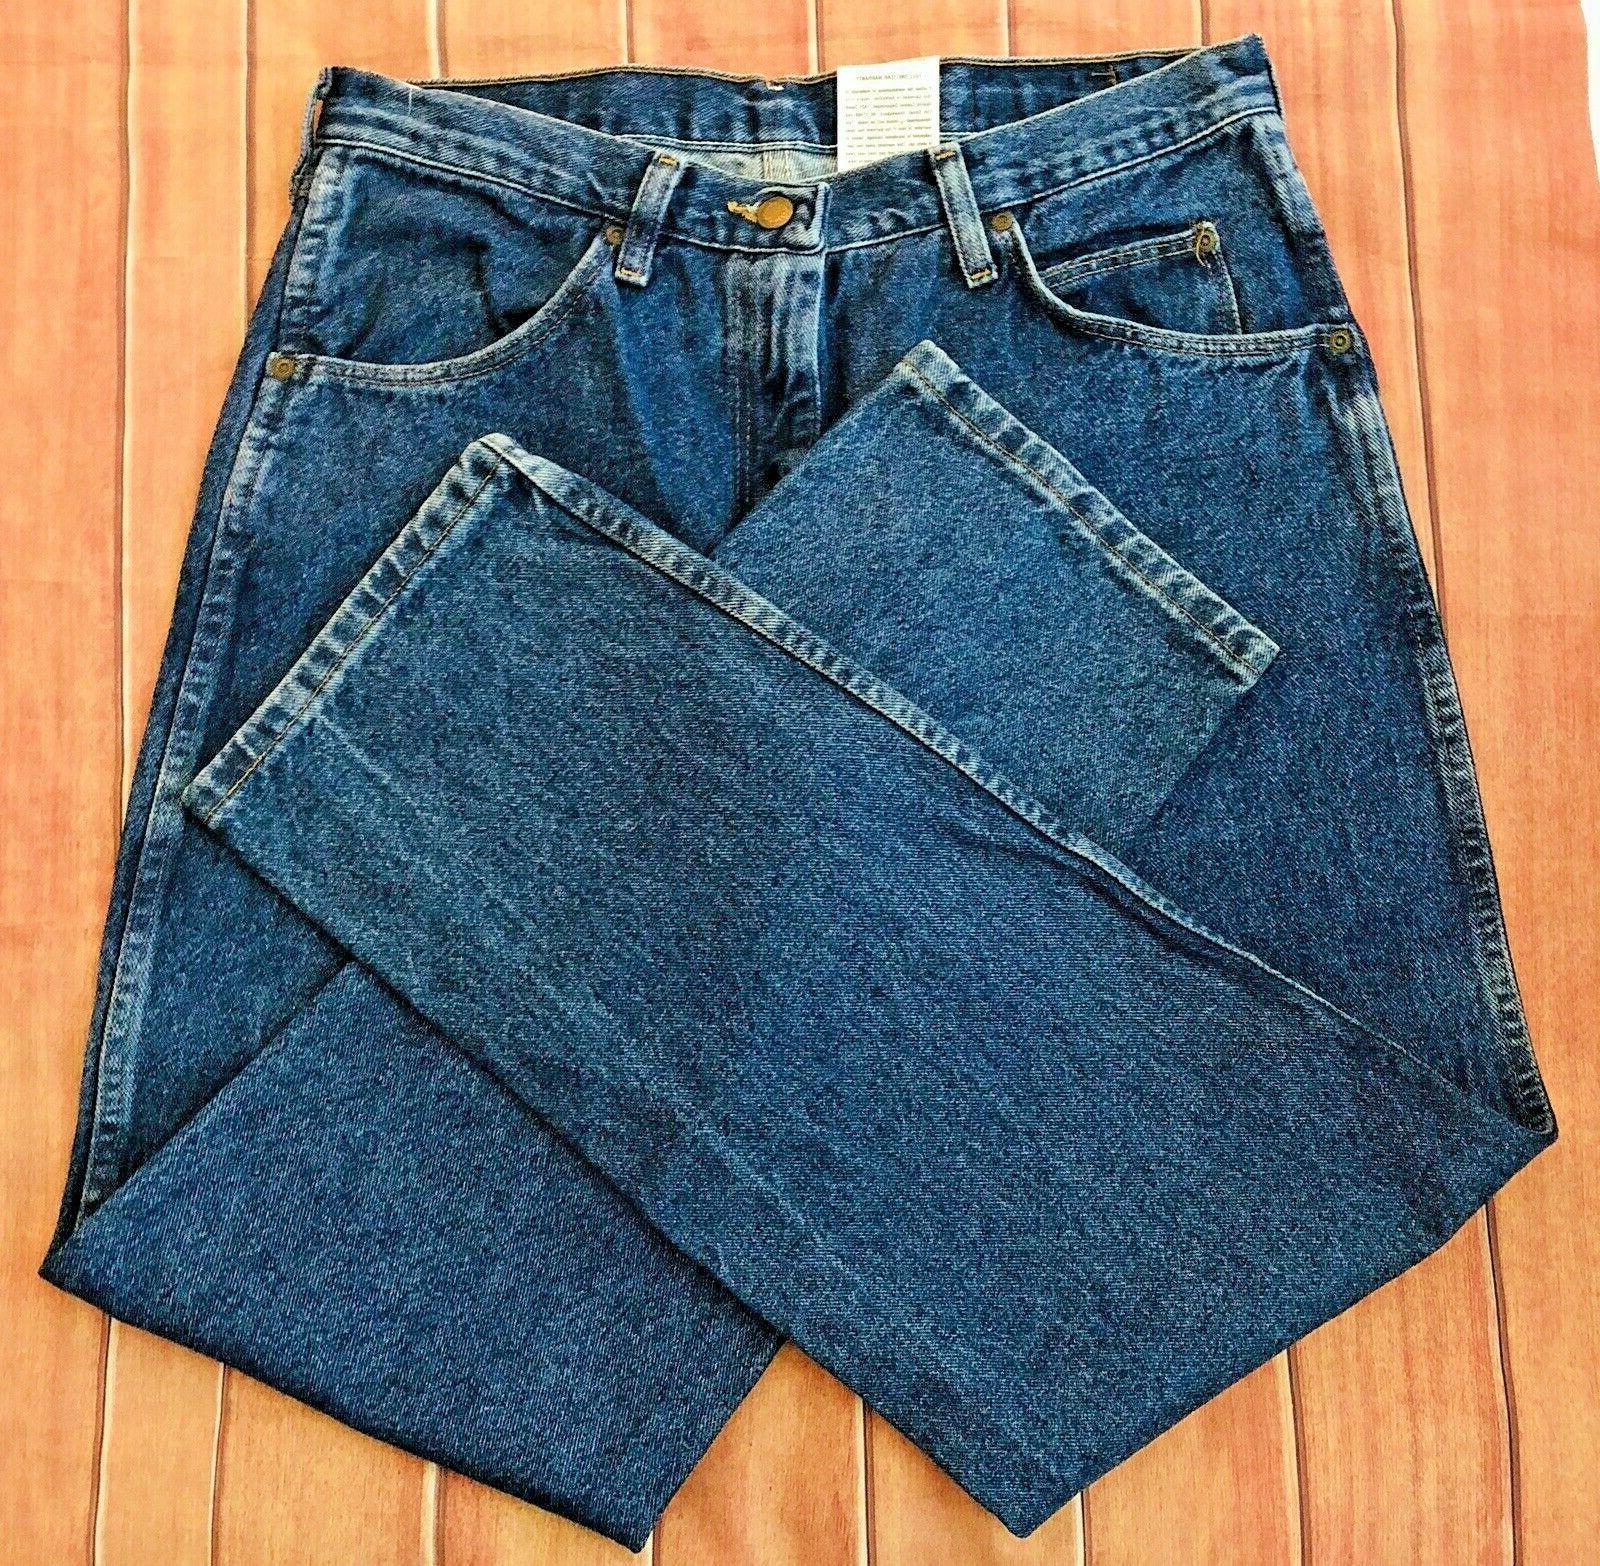 New Men's Fit 5 Premium Denim Jeans 33x30